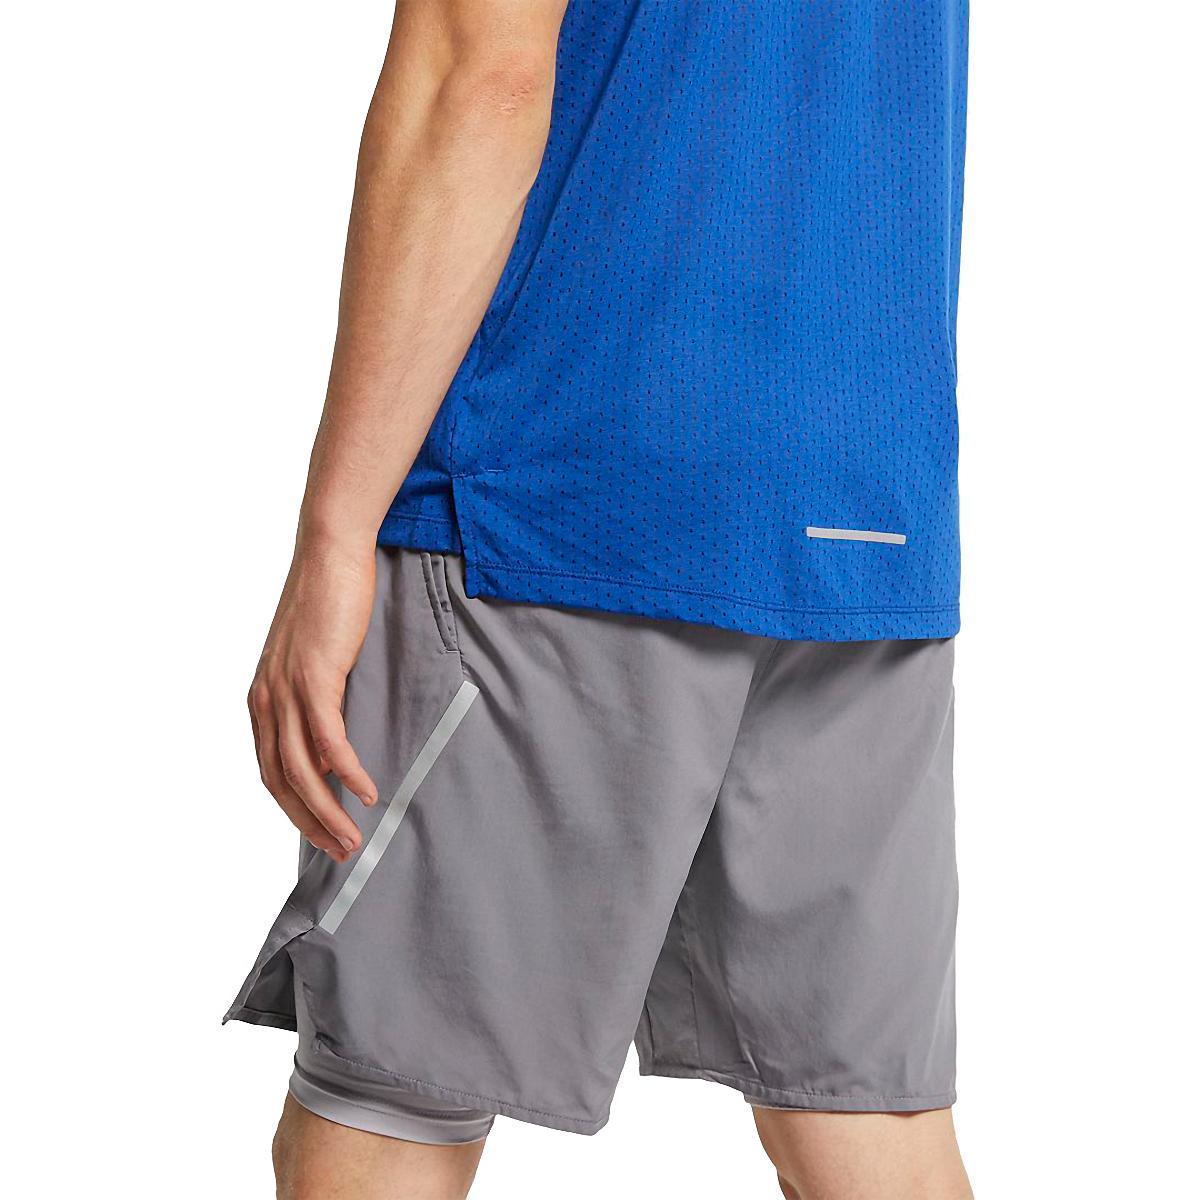 Men's Nike Breathe Rise 365 Short Sleeve  - Color: Indigo Force/Reflective - Size: S, Indigo Force/Reflective, large, image 4